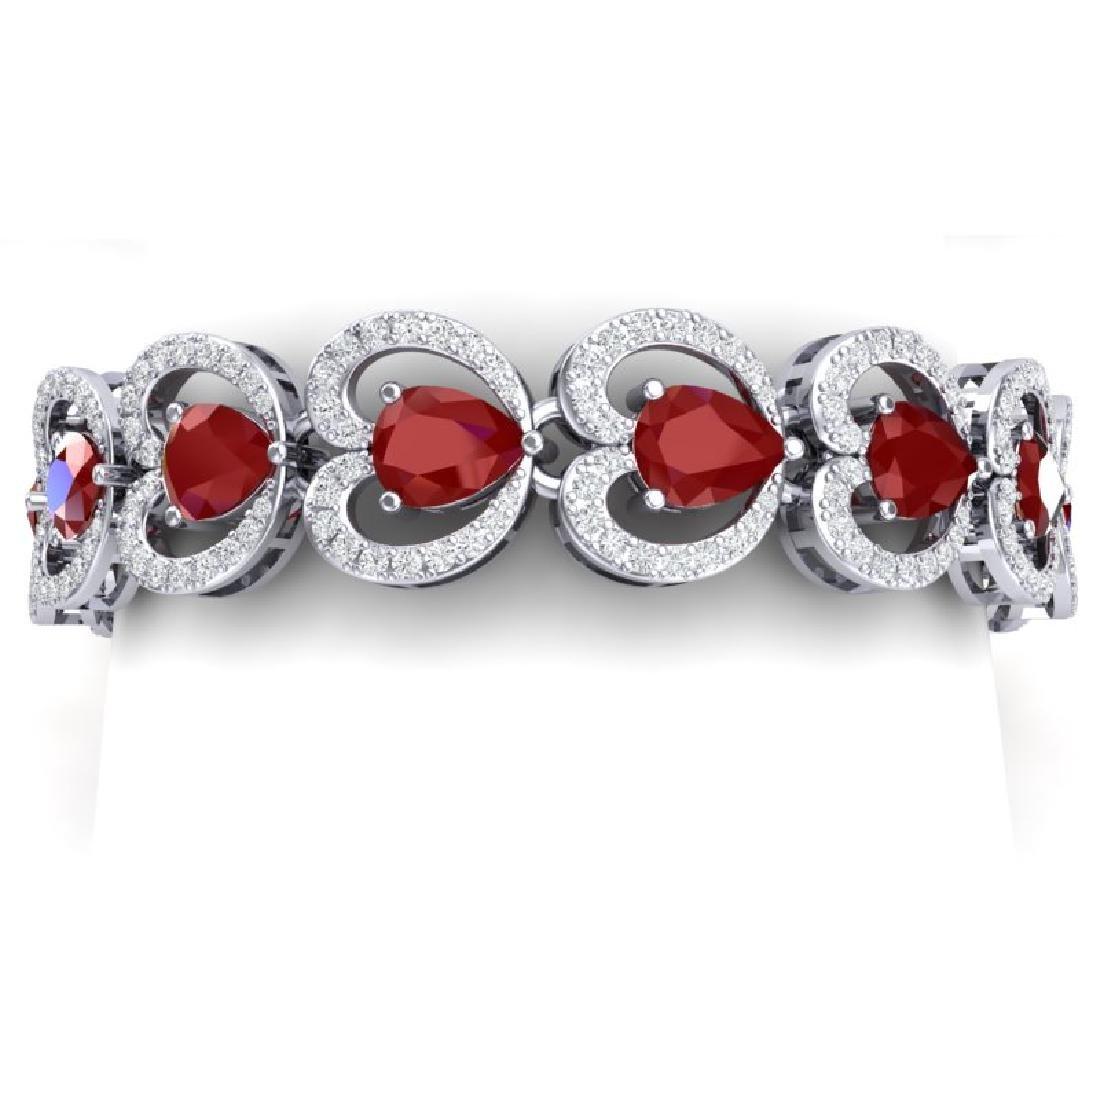 32.15 CTW Royalty Ruby & VS Diamond Bracelet 18K White